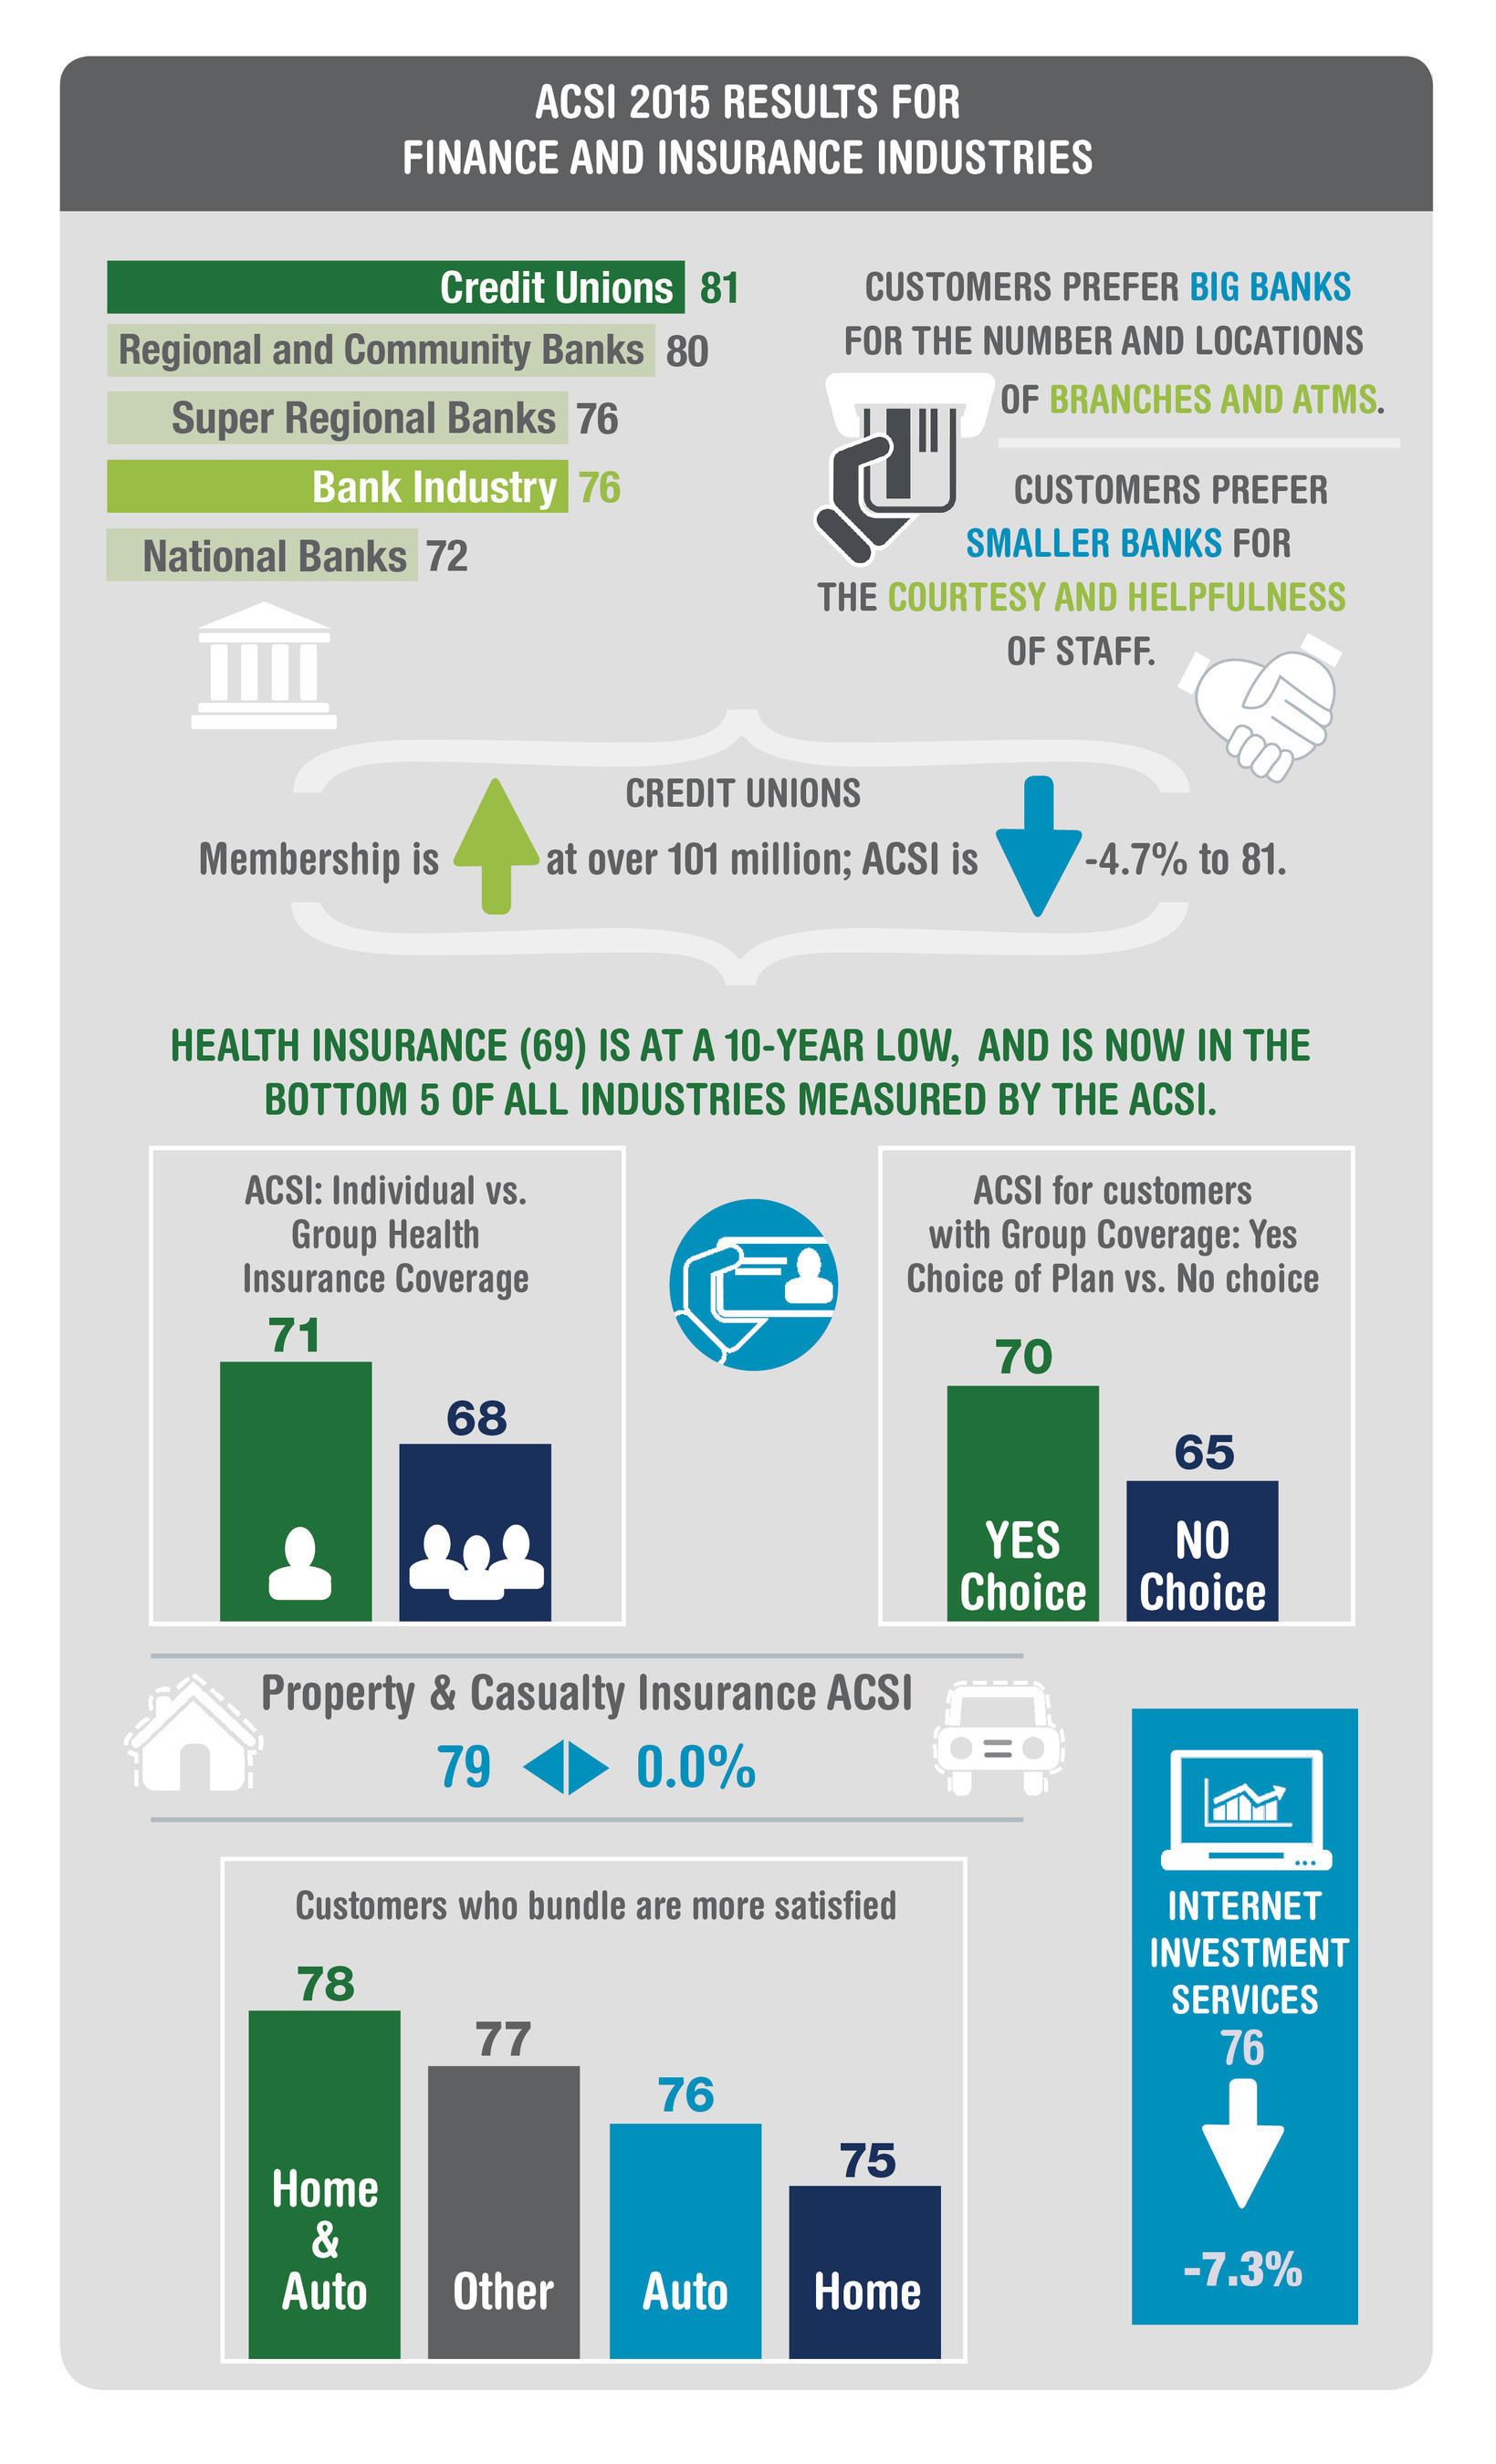 ACSI 2015 Finance & Insurance Infographic